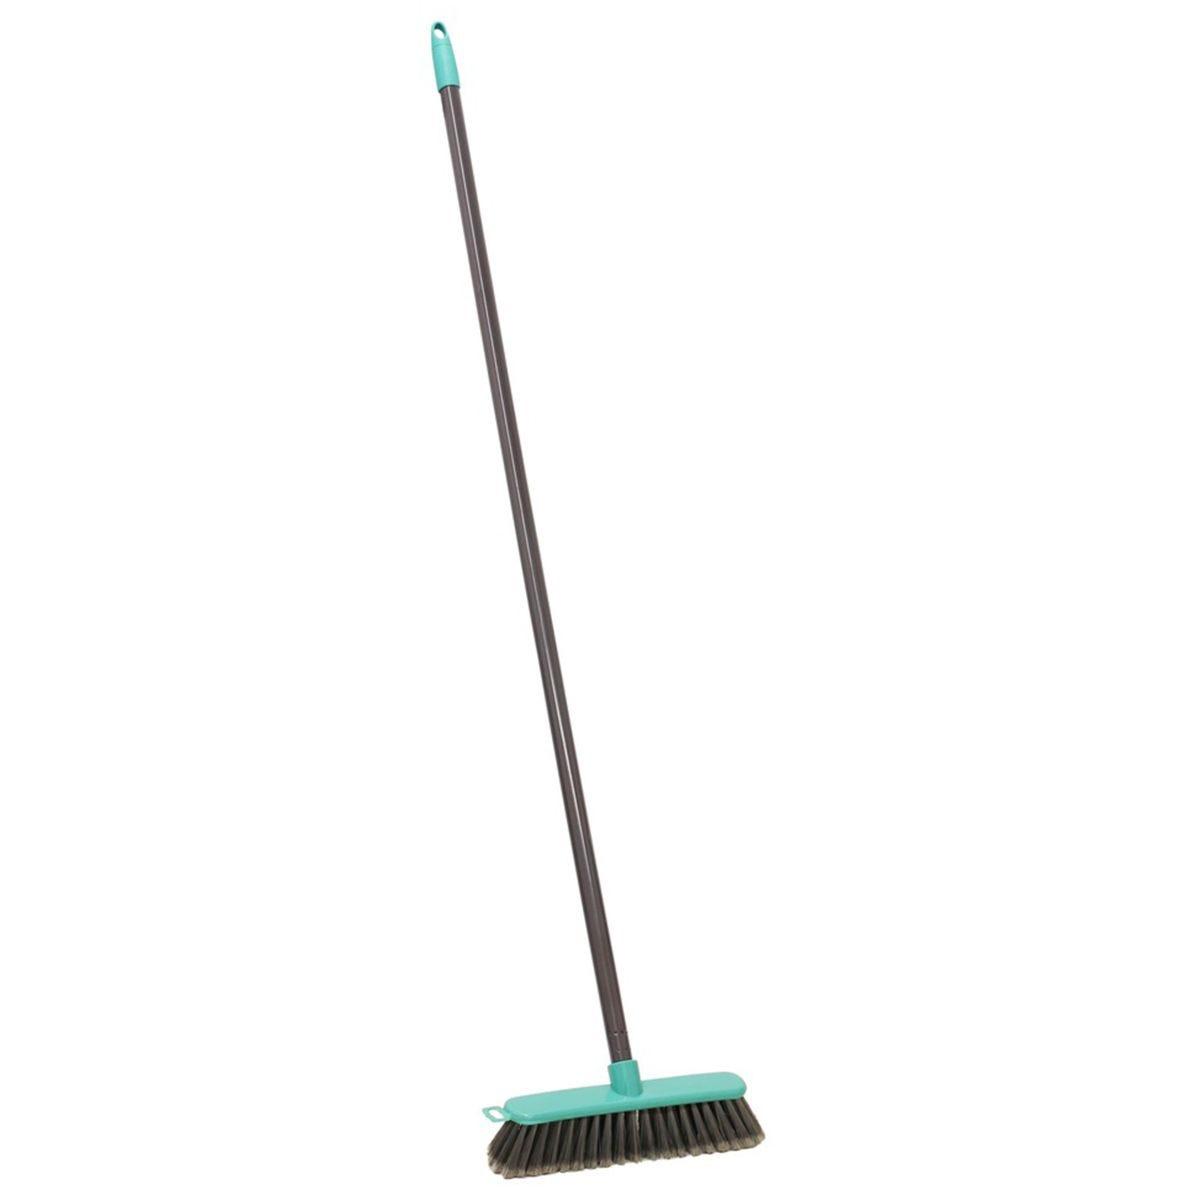 JVL Lightweight Indoor Angled Soft Bristle Sweeping Brush Broom Grey/Turquoise